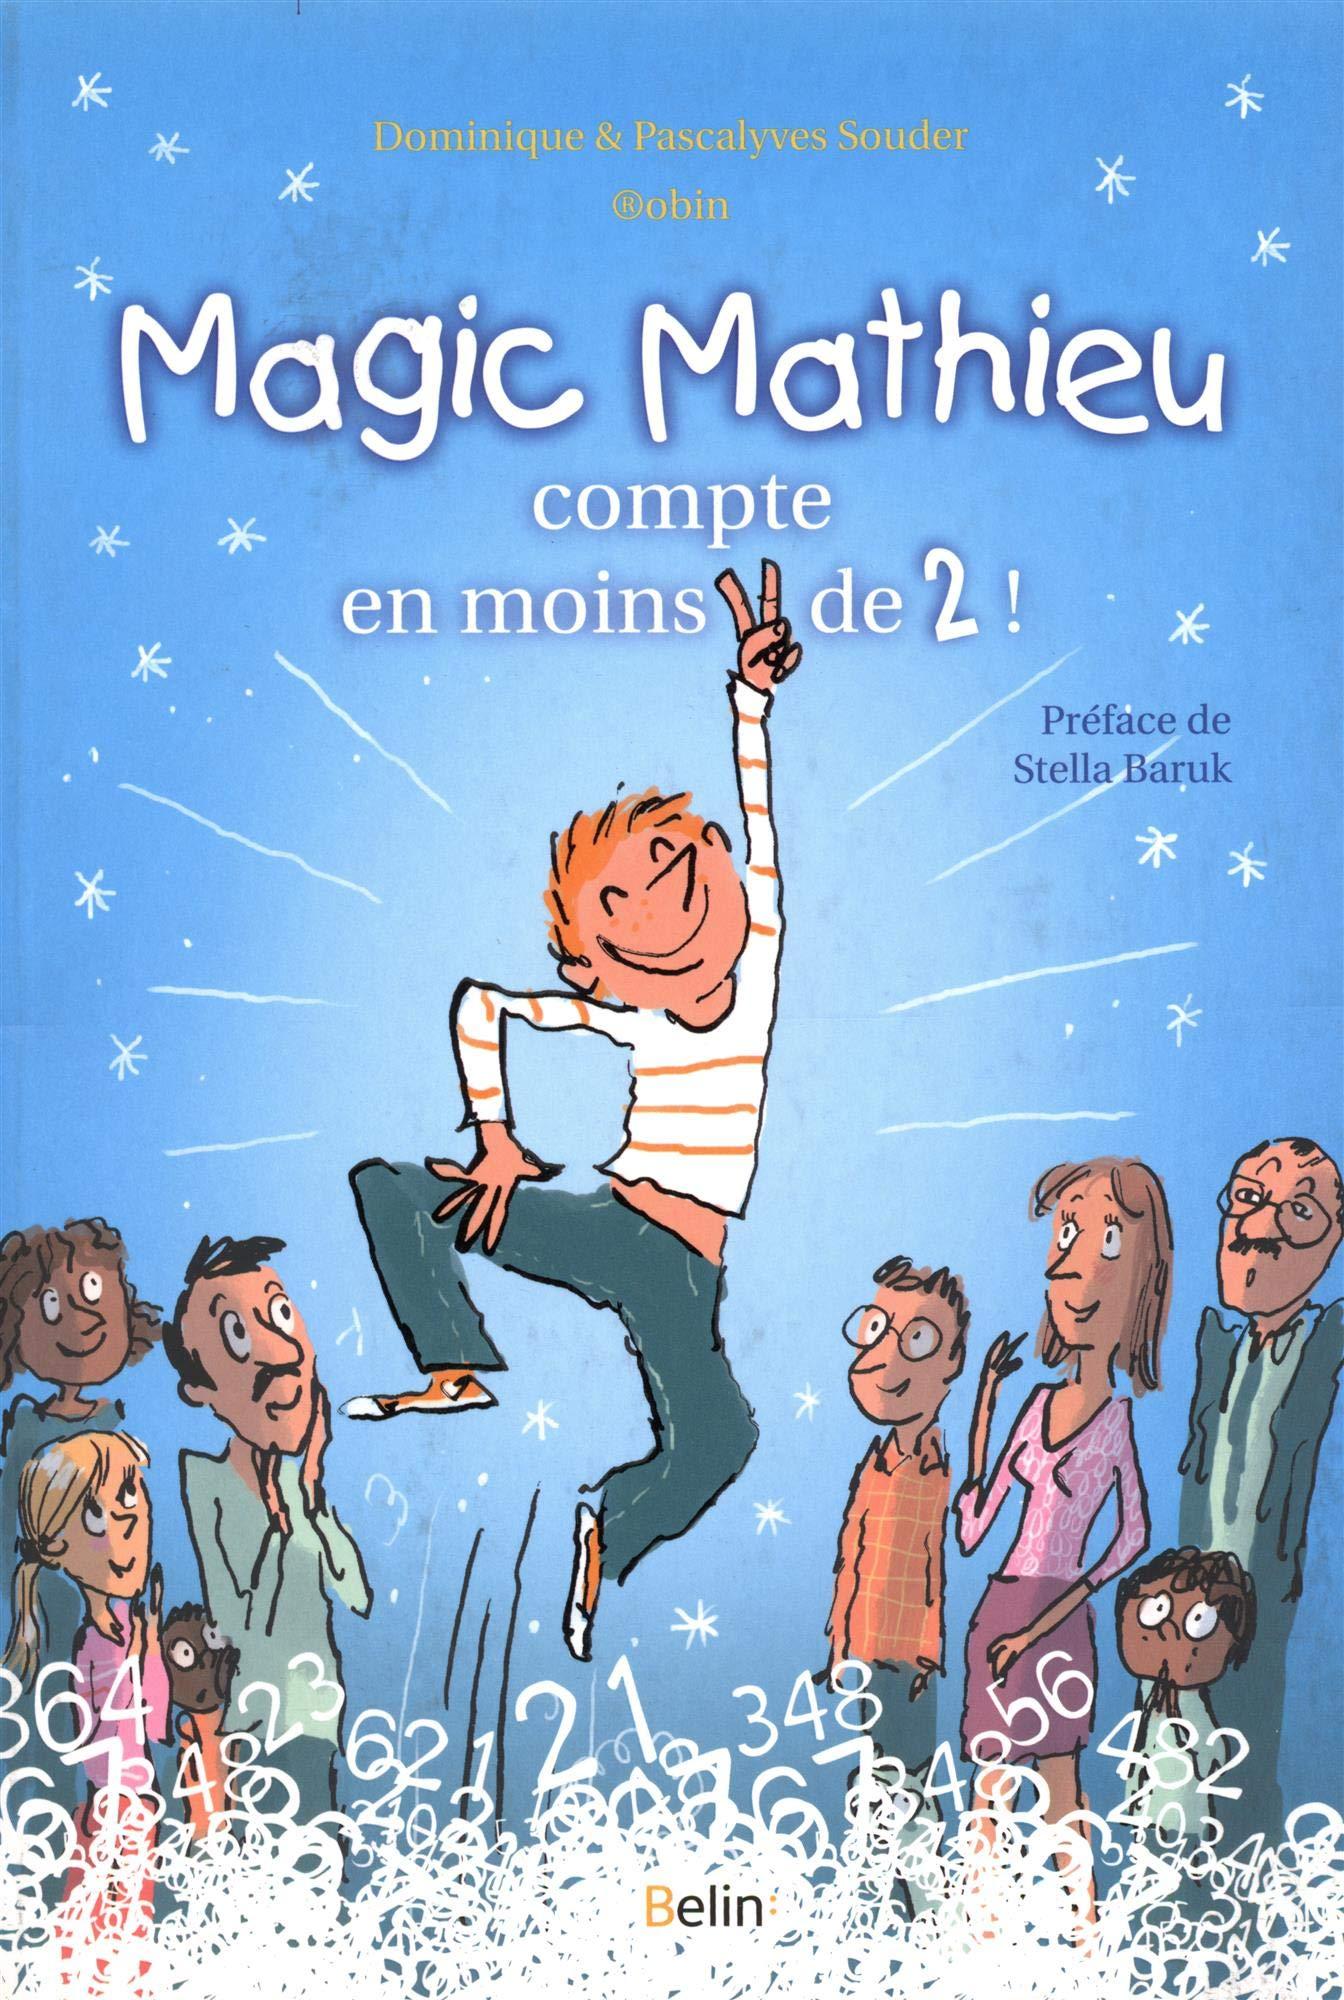 Magic mathieu compte en moins de 2 ! por Dominique Souder